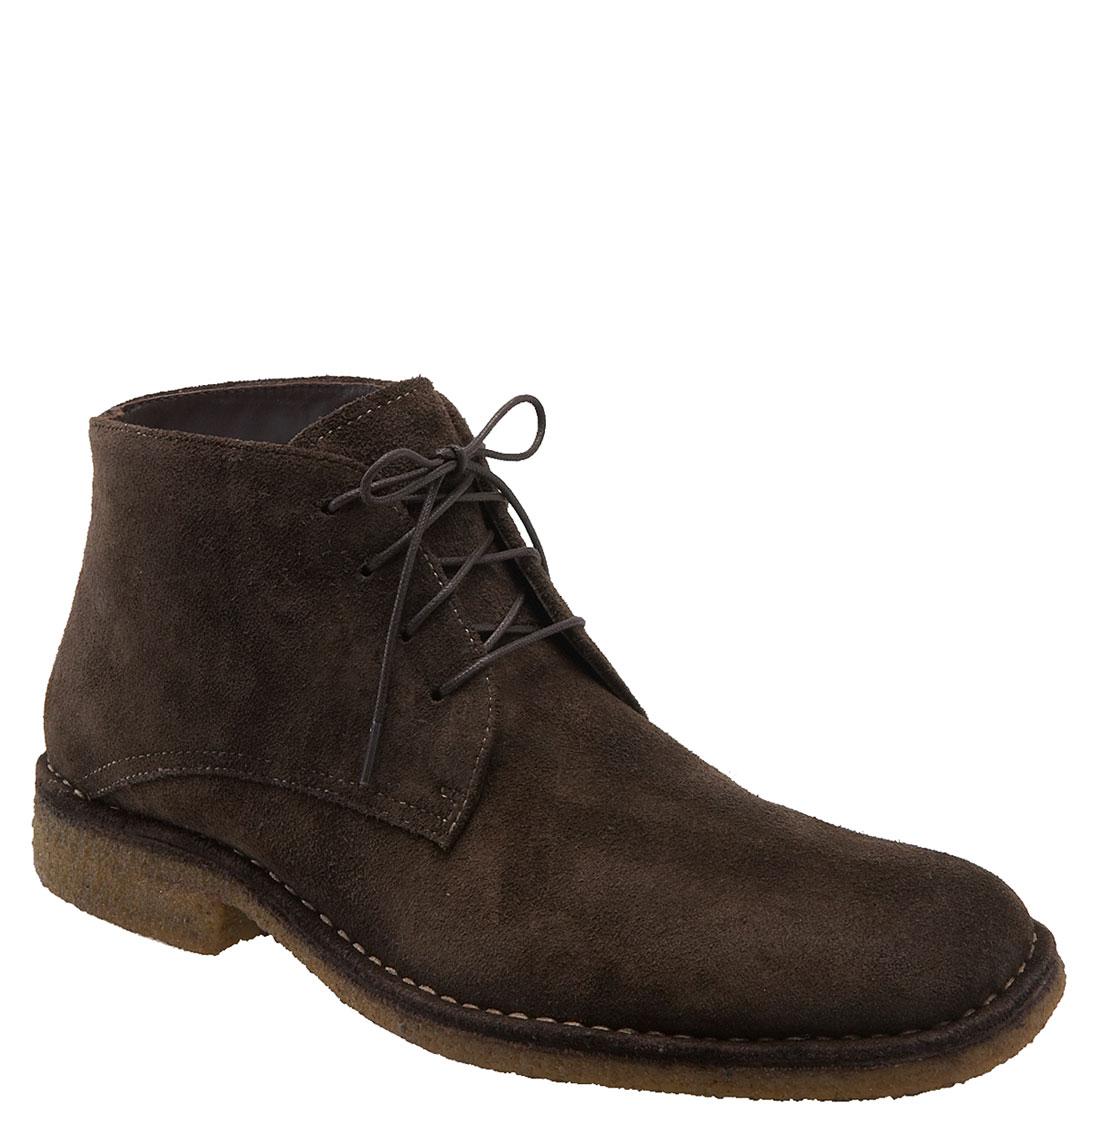 johnston murphy runnell chukka boot in brown for